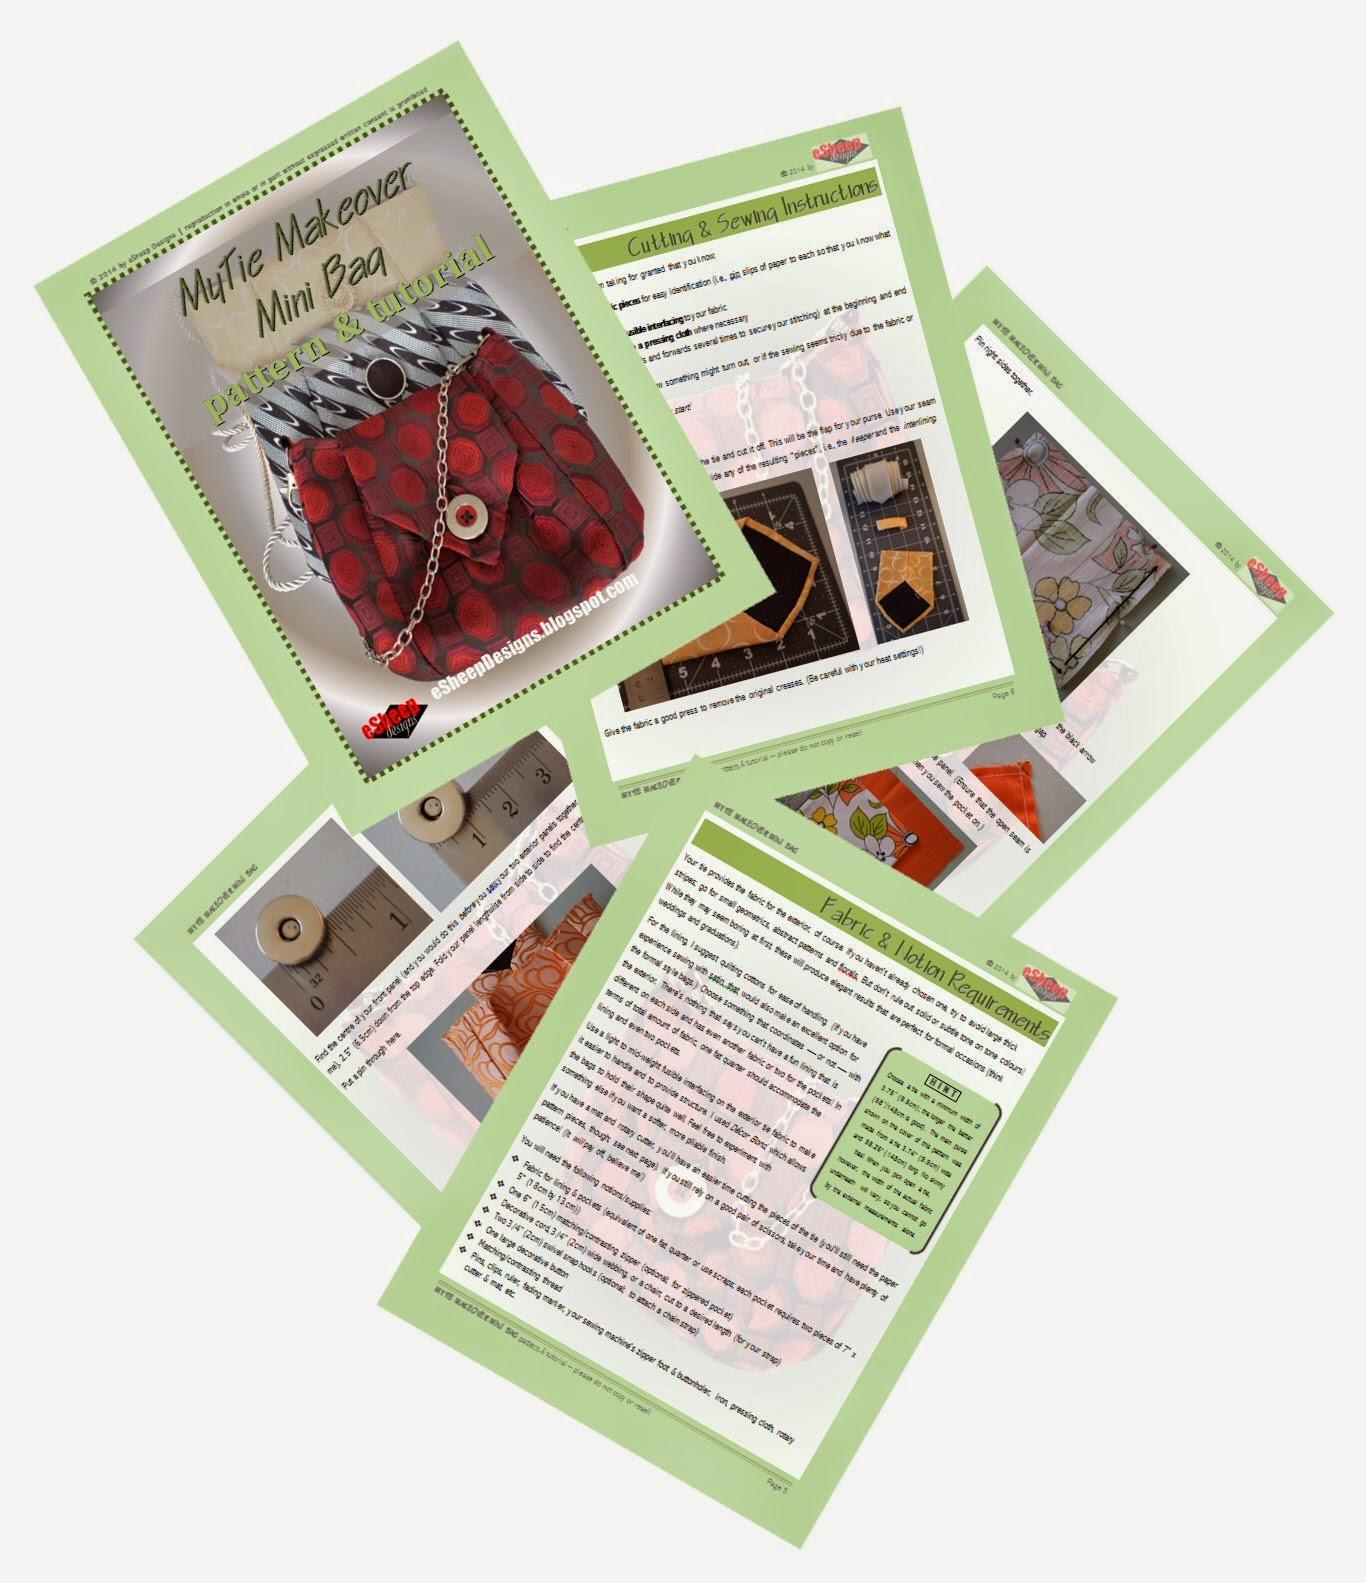 MyTie Makeover Mini Bag Pattern by eSheep Designs